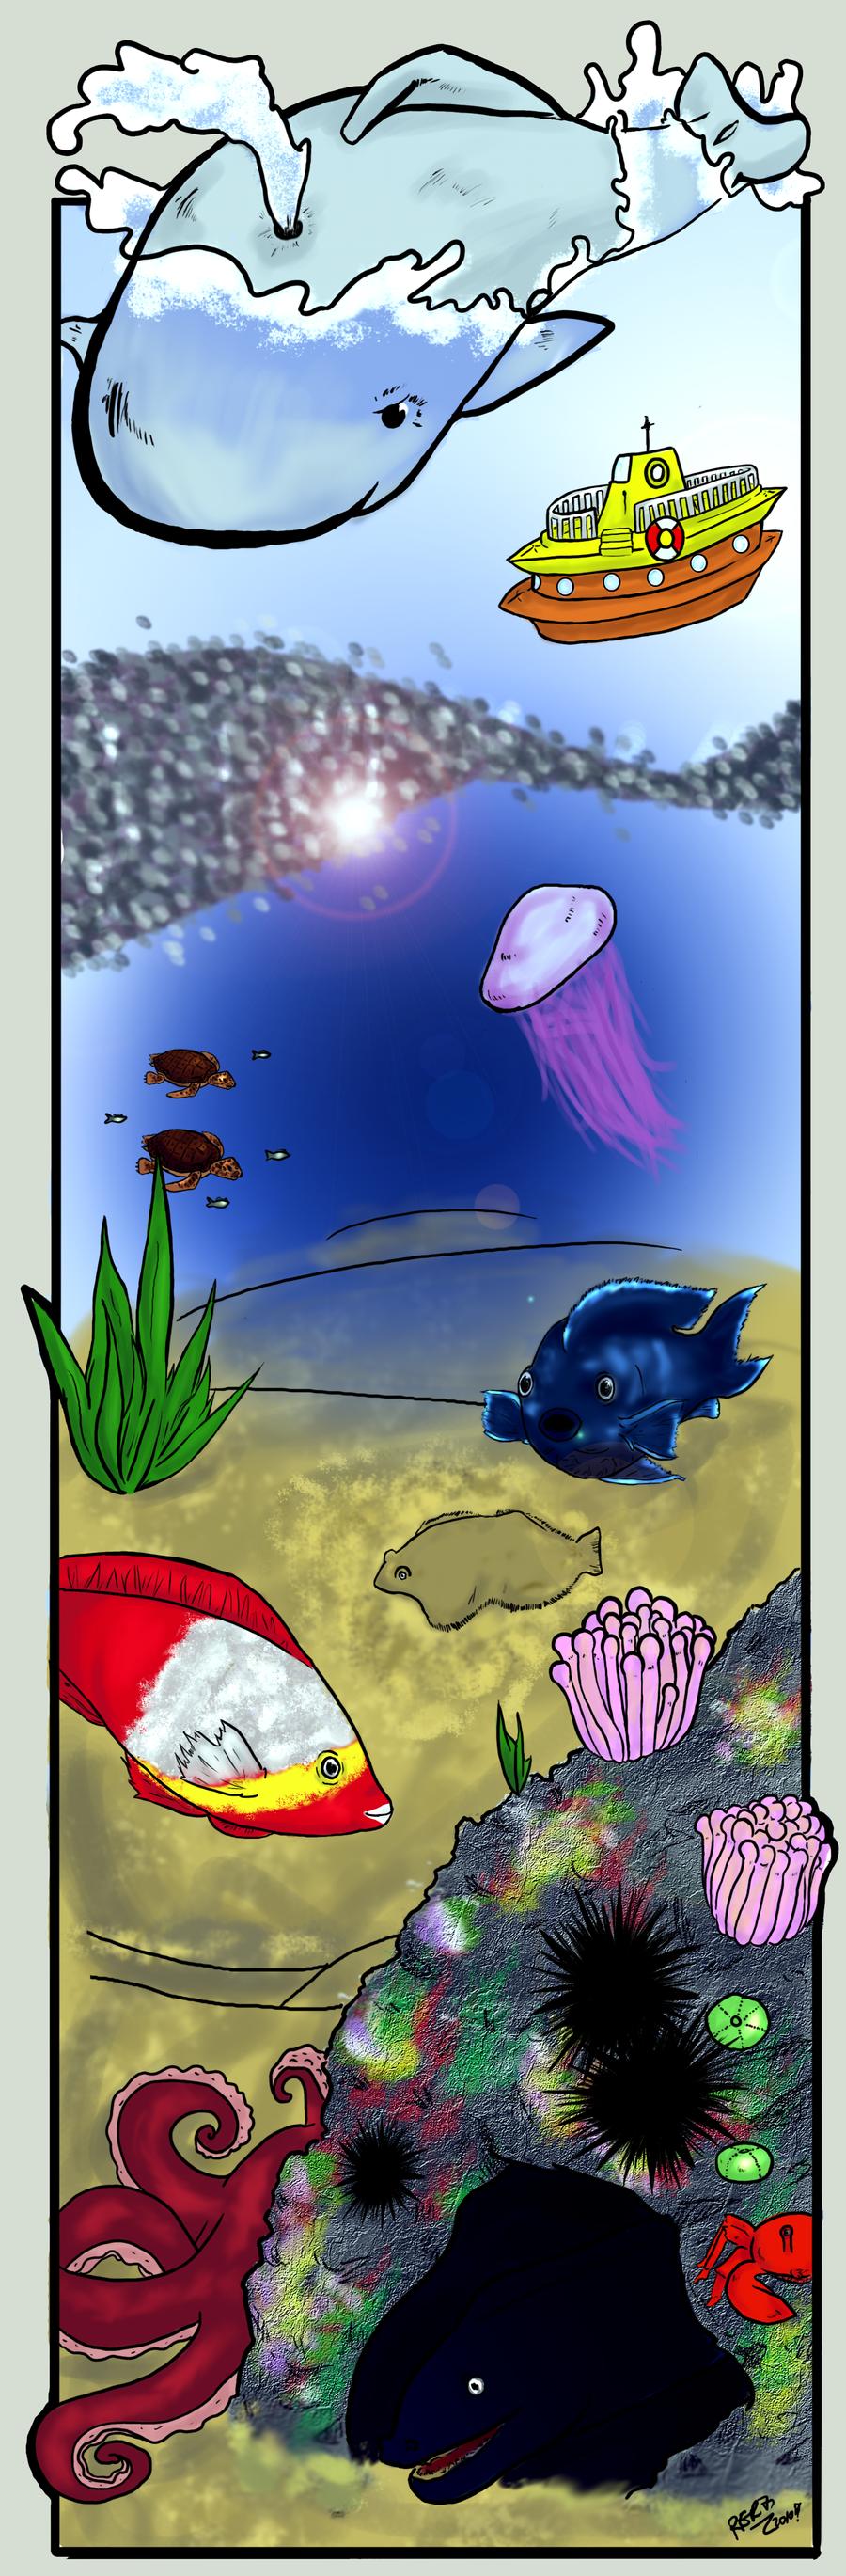 Life under the sea by ShiOkami-chan